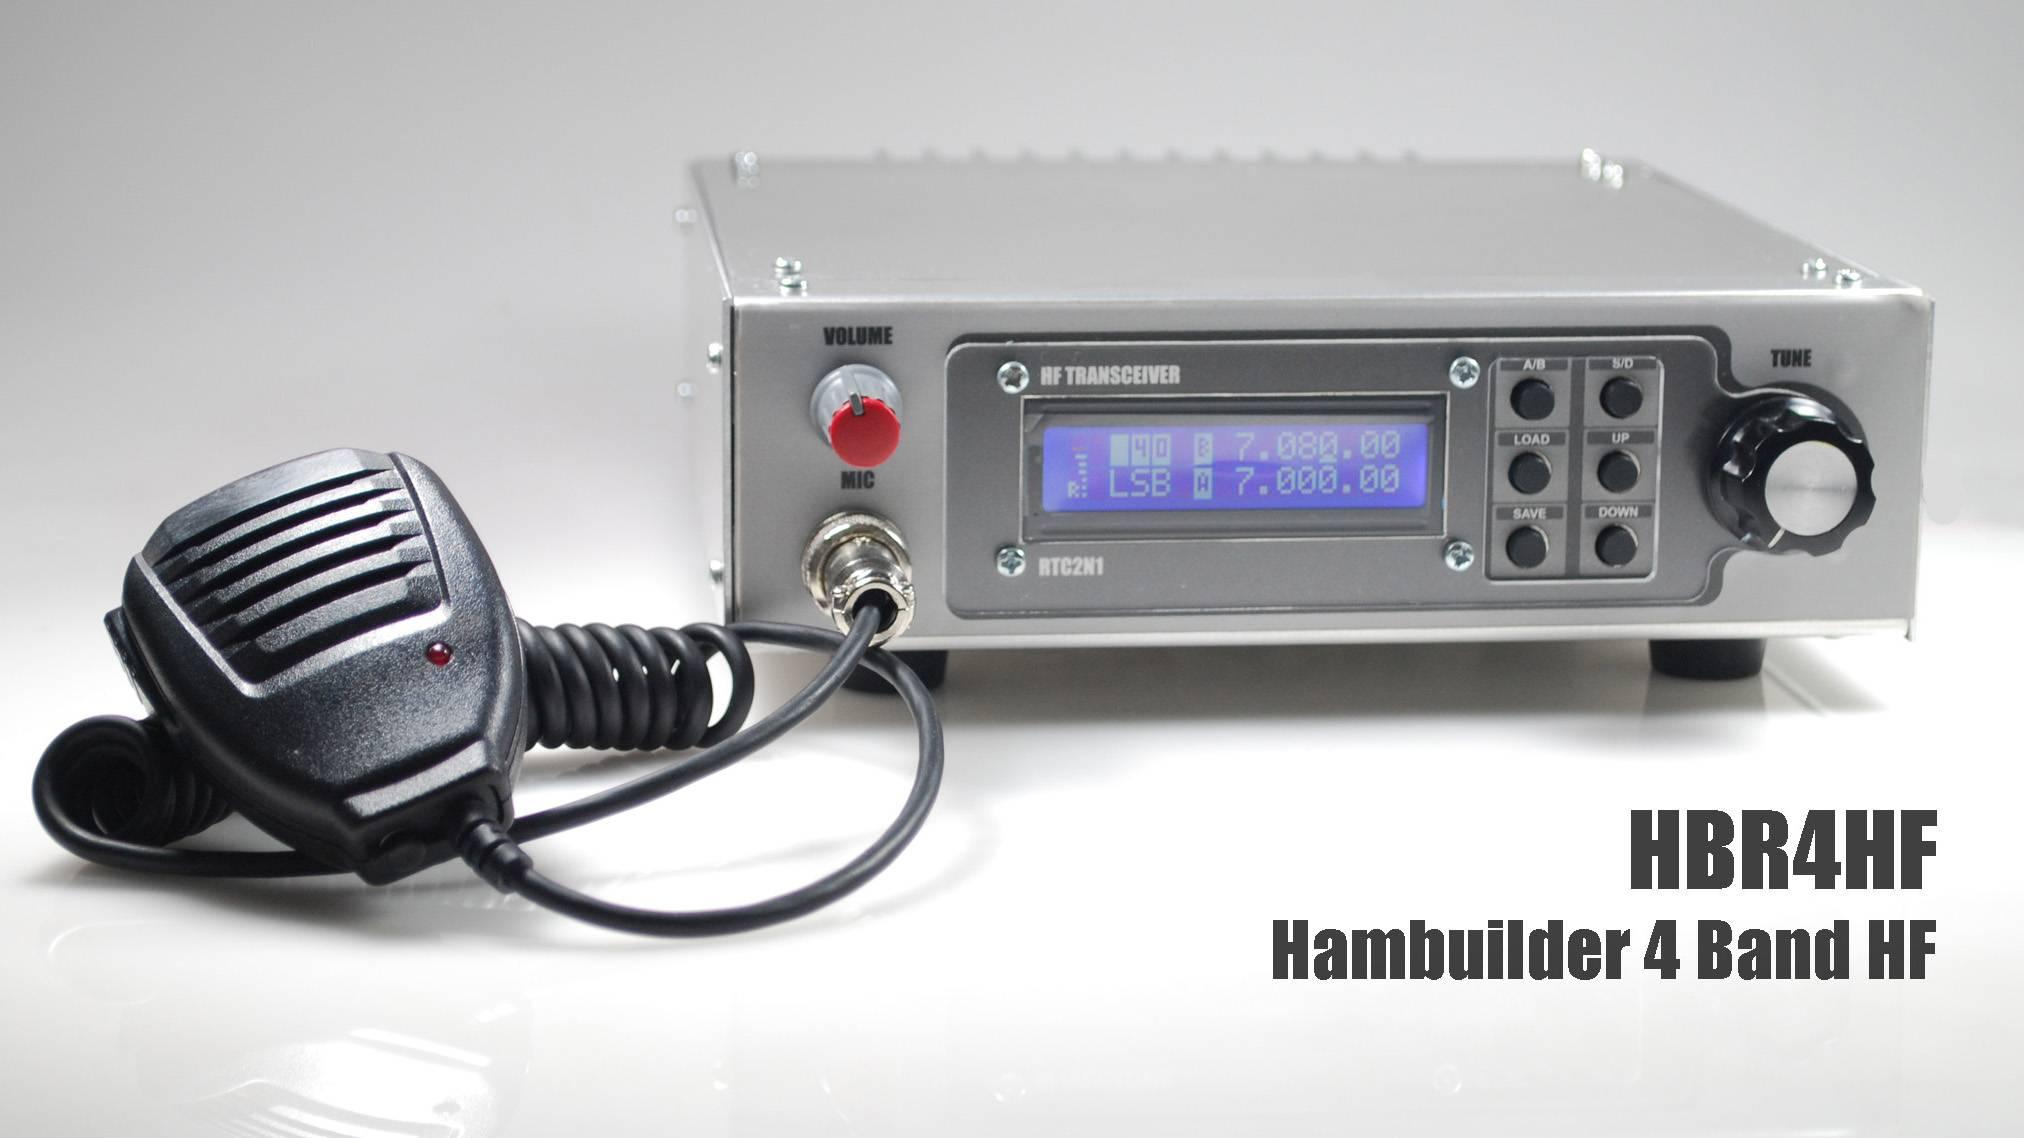 Hambuilder HBR4HF 4波段短波收发信机